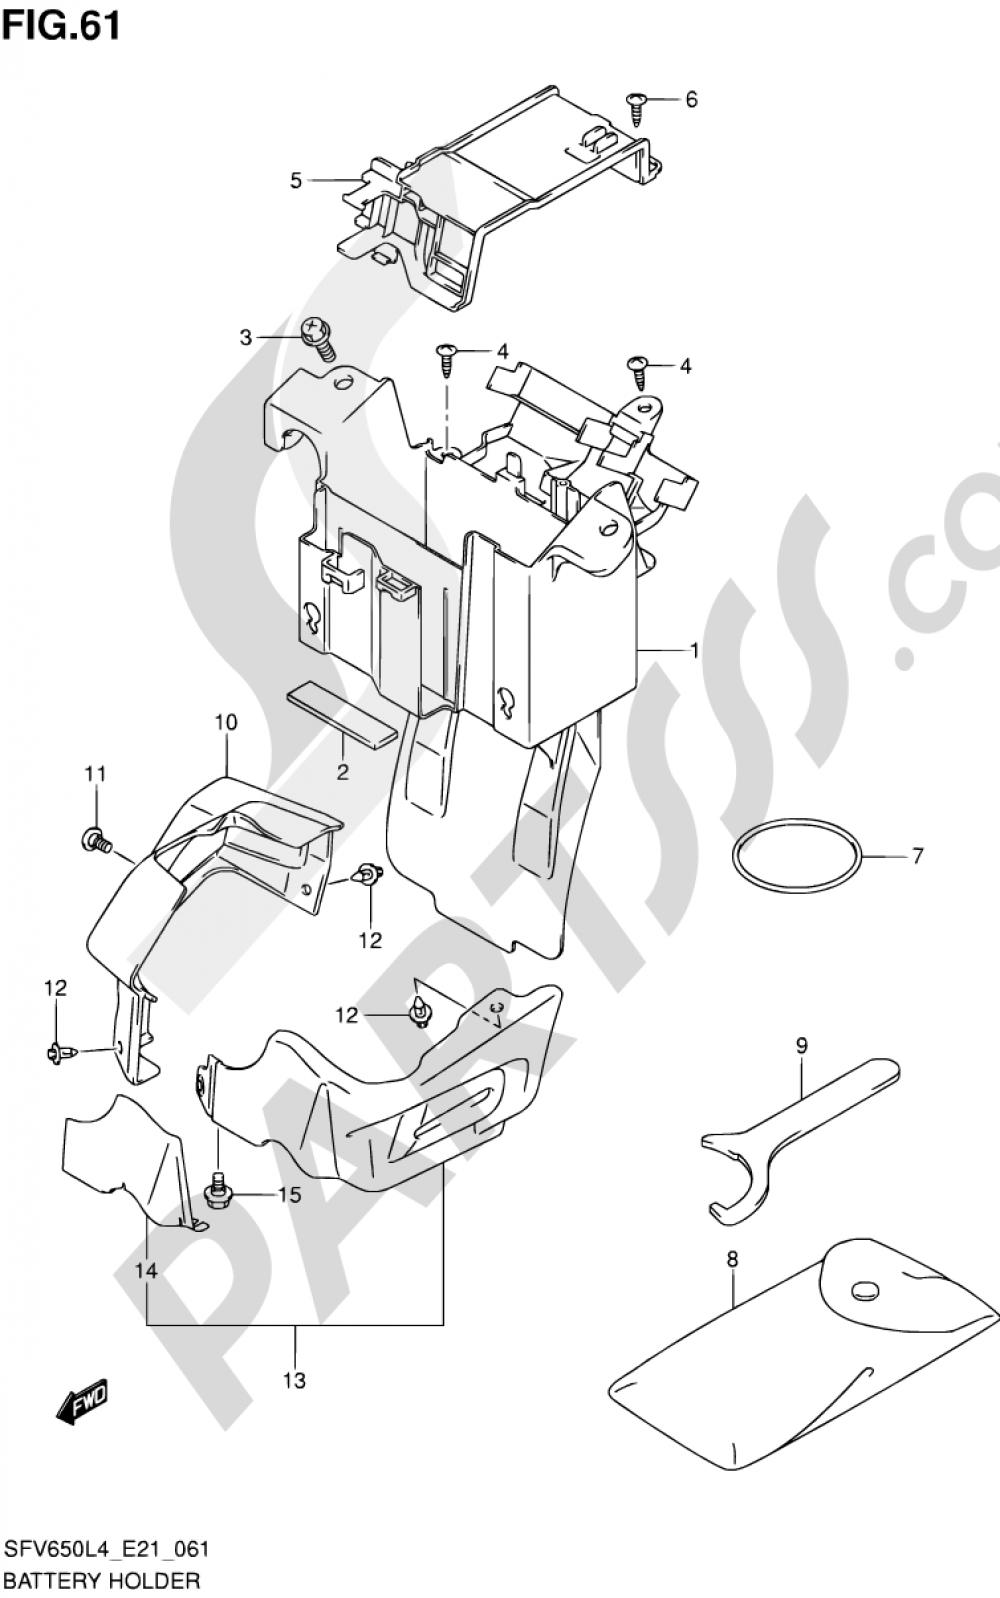 61 - BATTERY HOLDER (SFV650AL4 E21) Suzuki GLADIUS SFV650A 2014